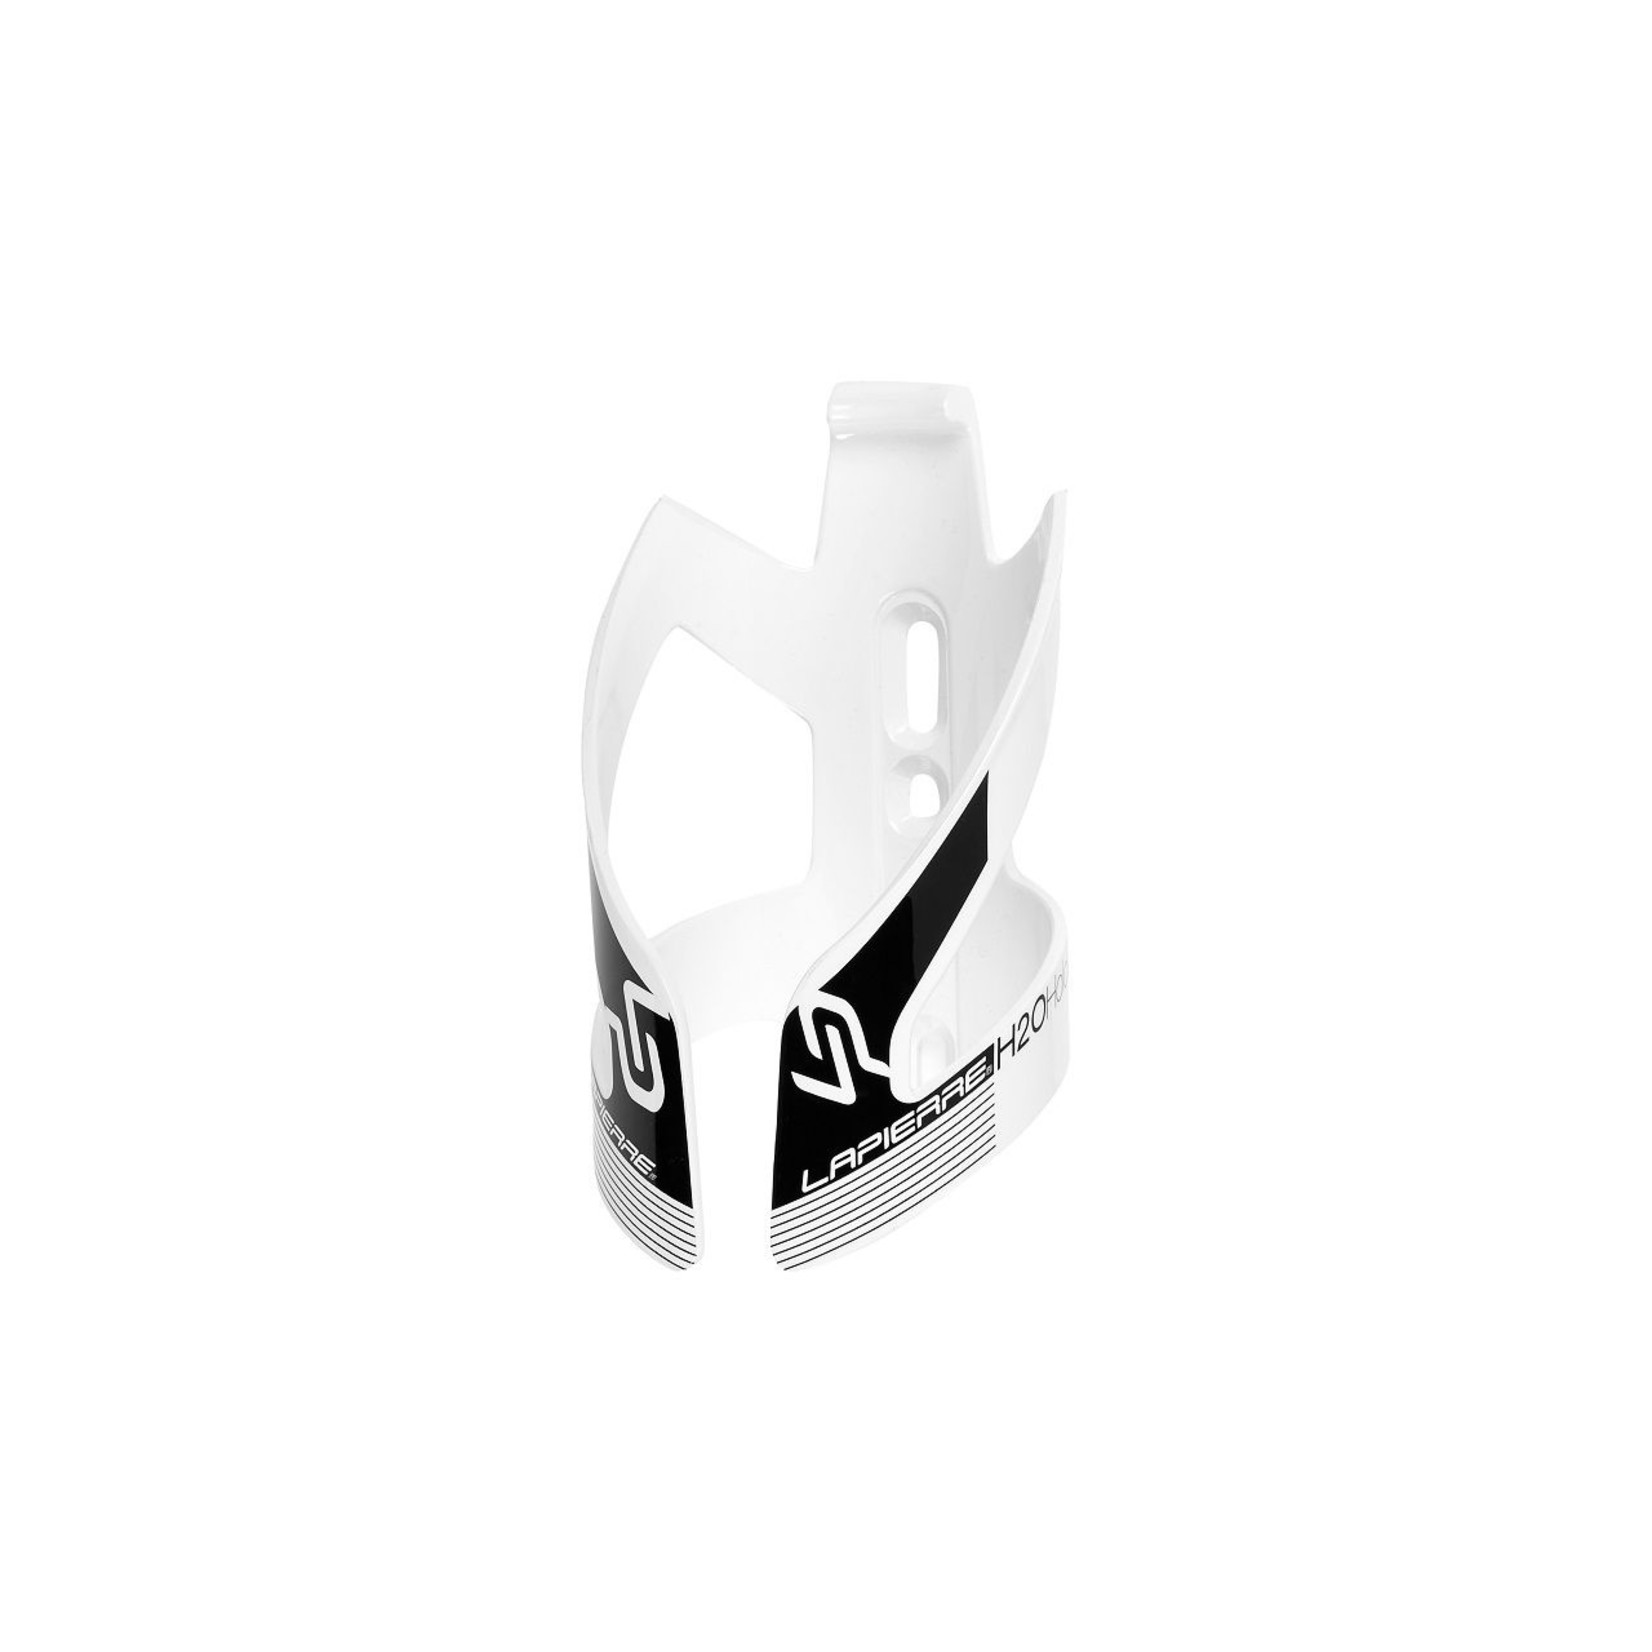 Lapierre Universal Bottle Cage White